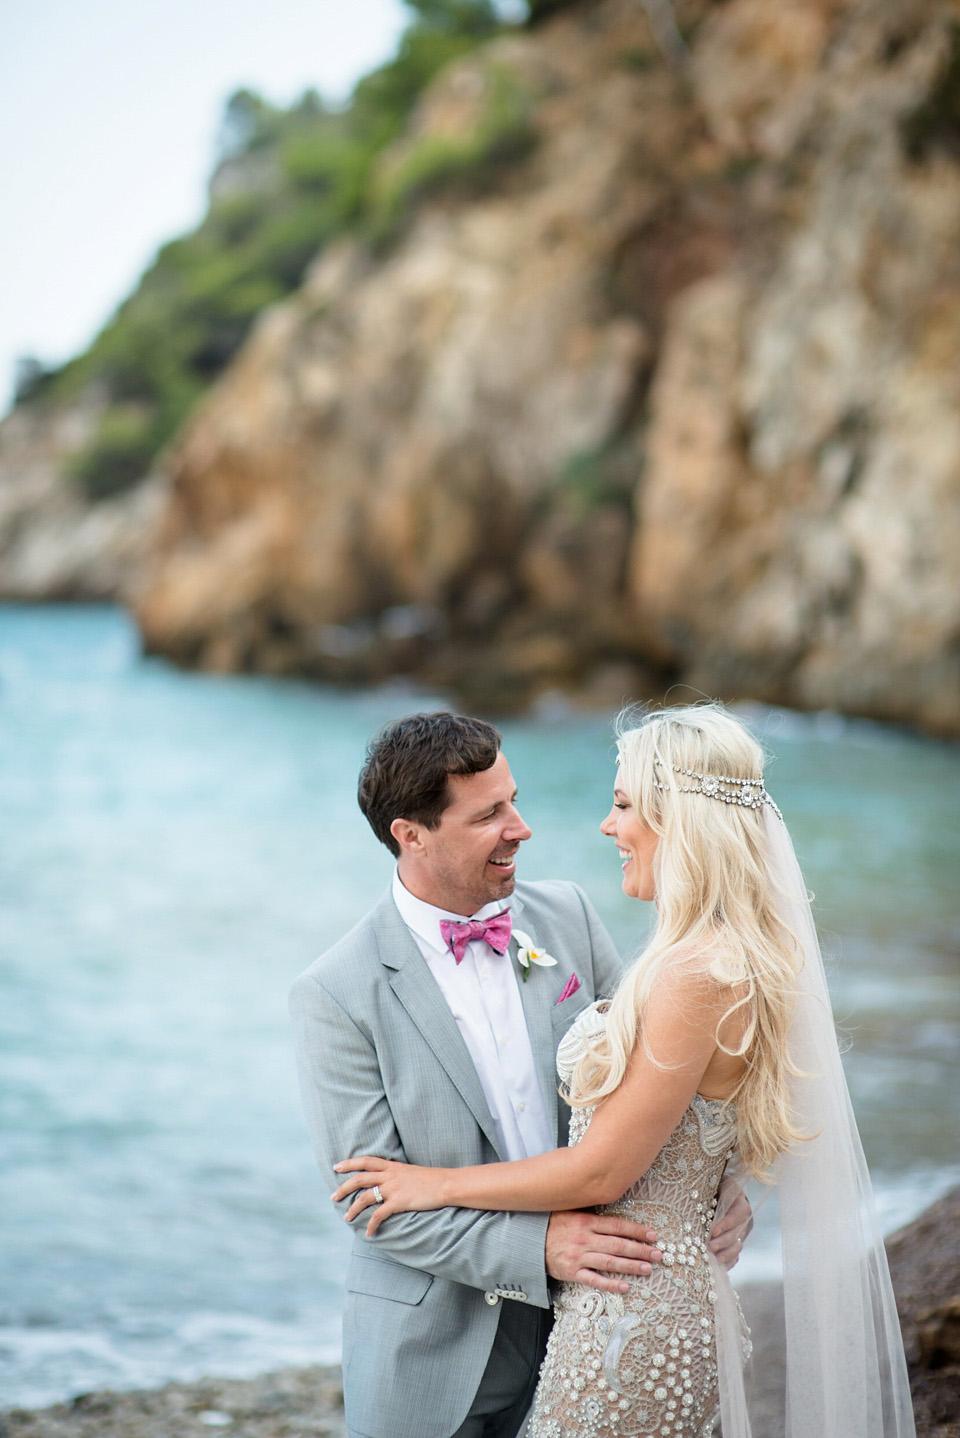 7fbfa41c010fb wpid jaton couture ibiza wedding gypsy westwood - A Mermaid Inspired Dress  for an Ibiza Wedding